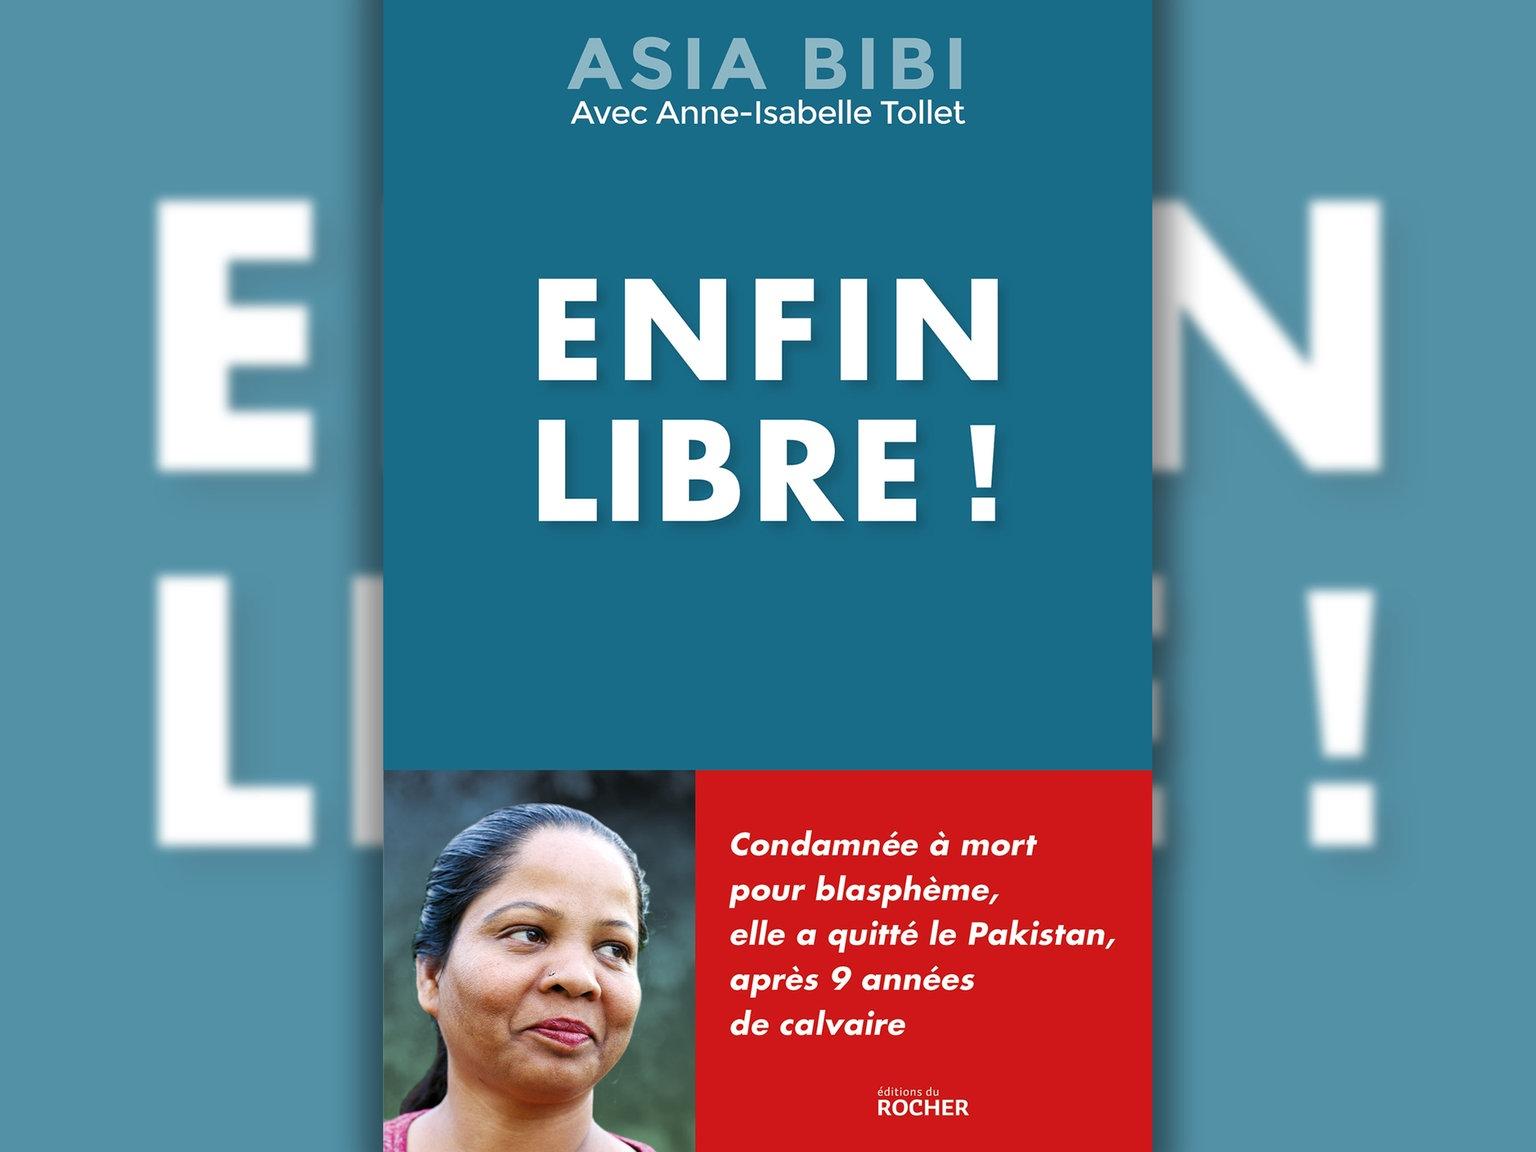 asia-bibi-enfin-libre-100__v-HintergrundL.jpg